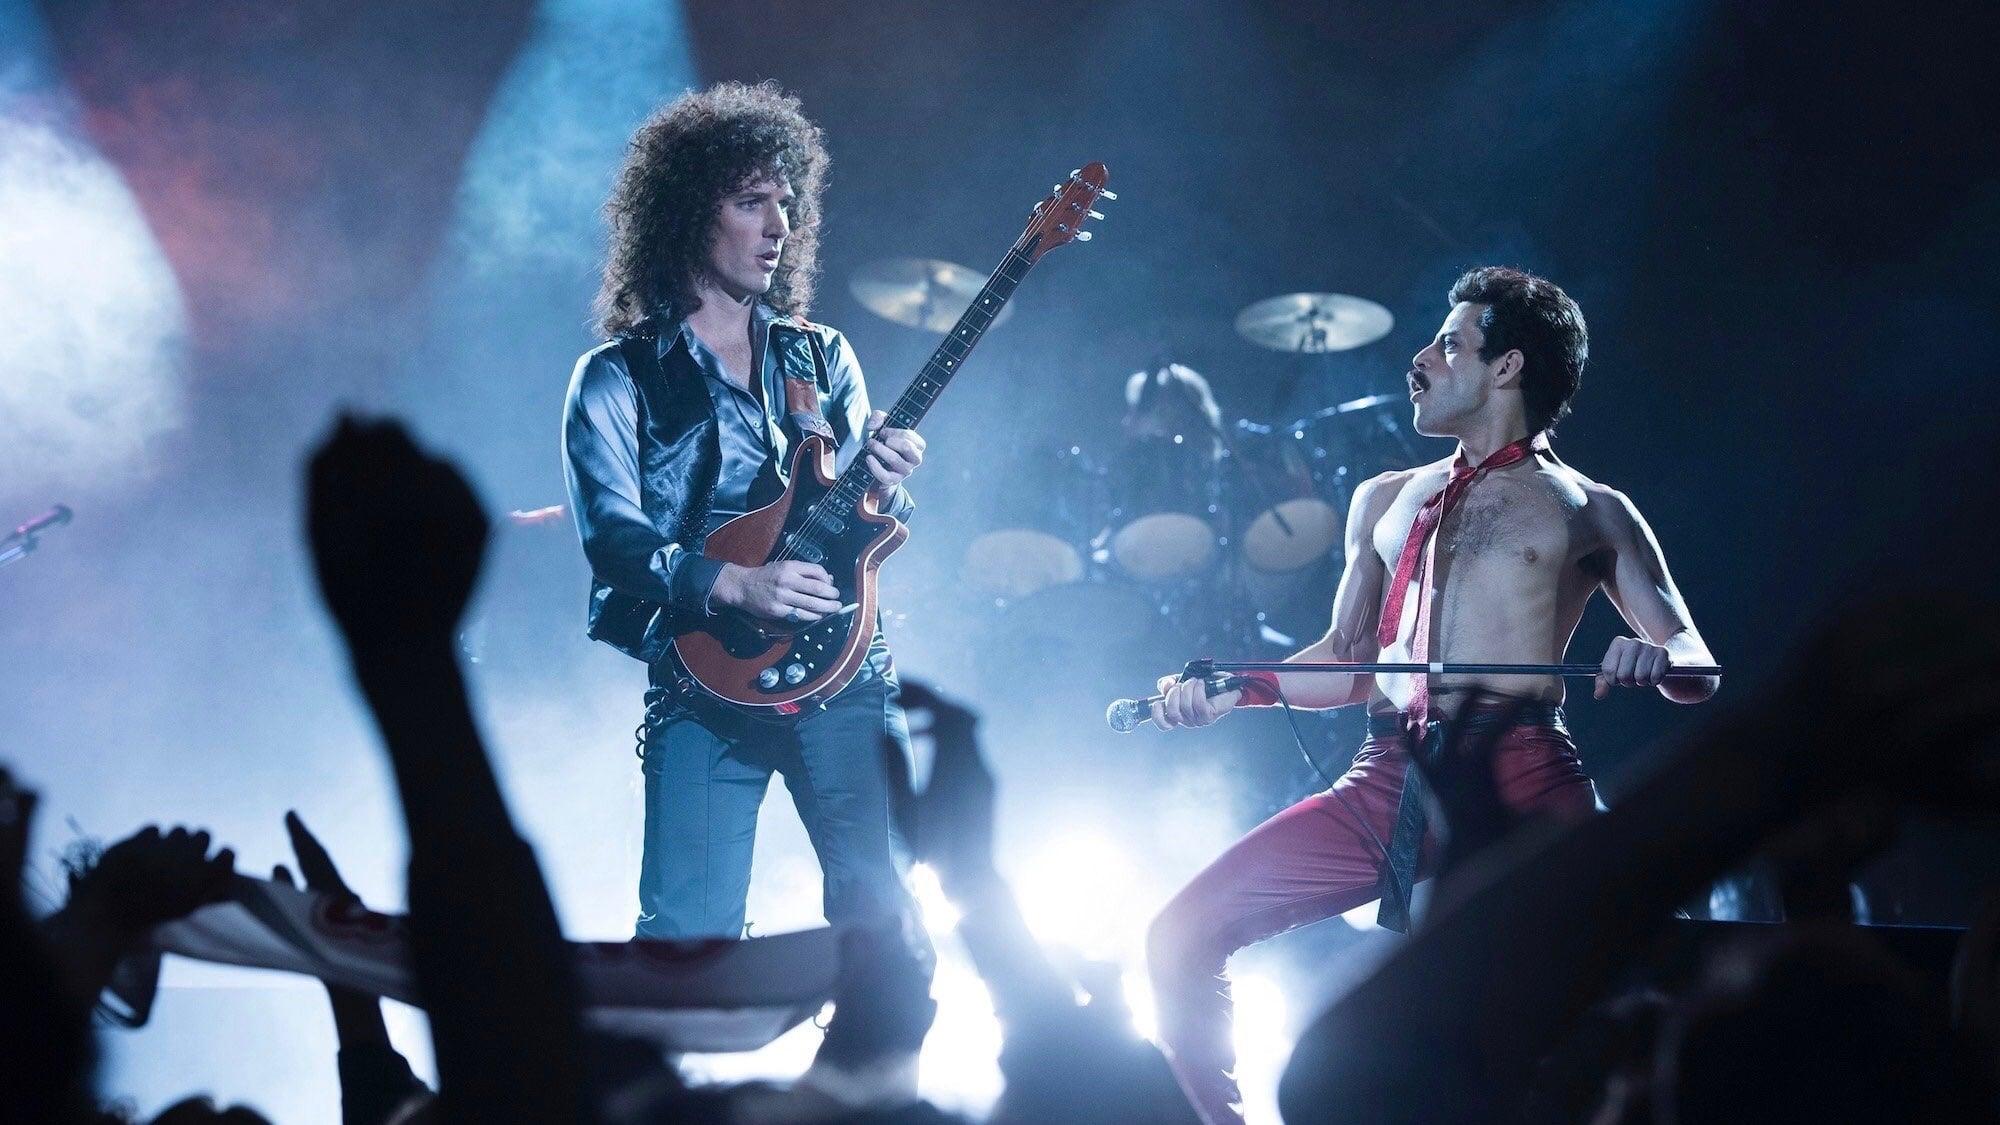 Image: Bohemian Rhapsody/TMDb